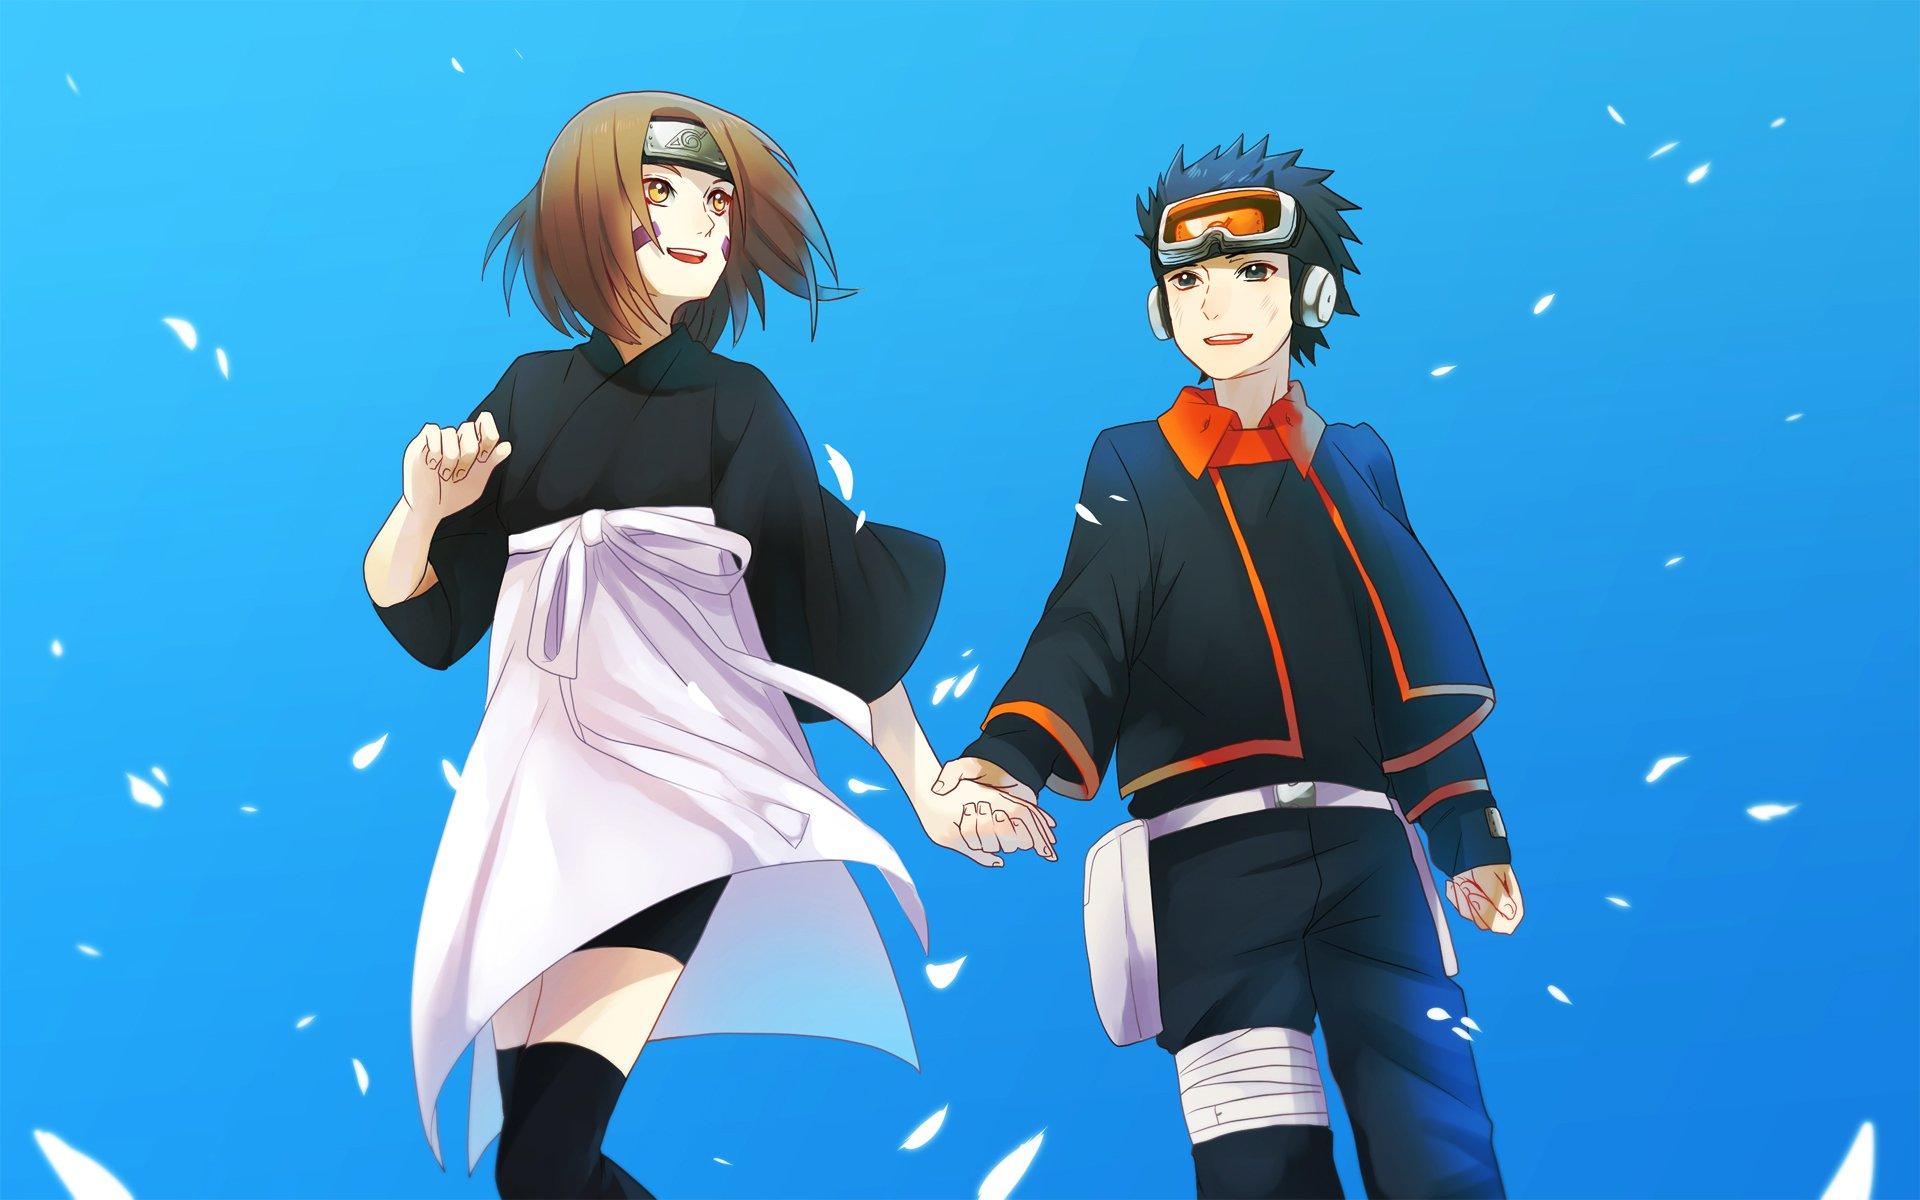 Anime - Naruto  Rin Nohara Obito Uchiha Wallpaper